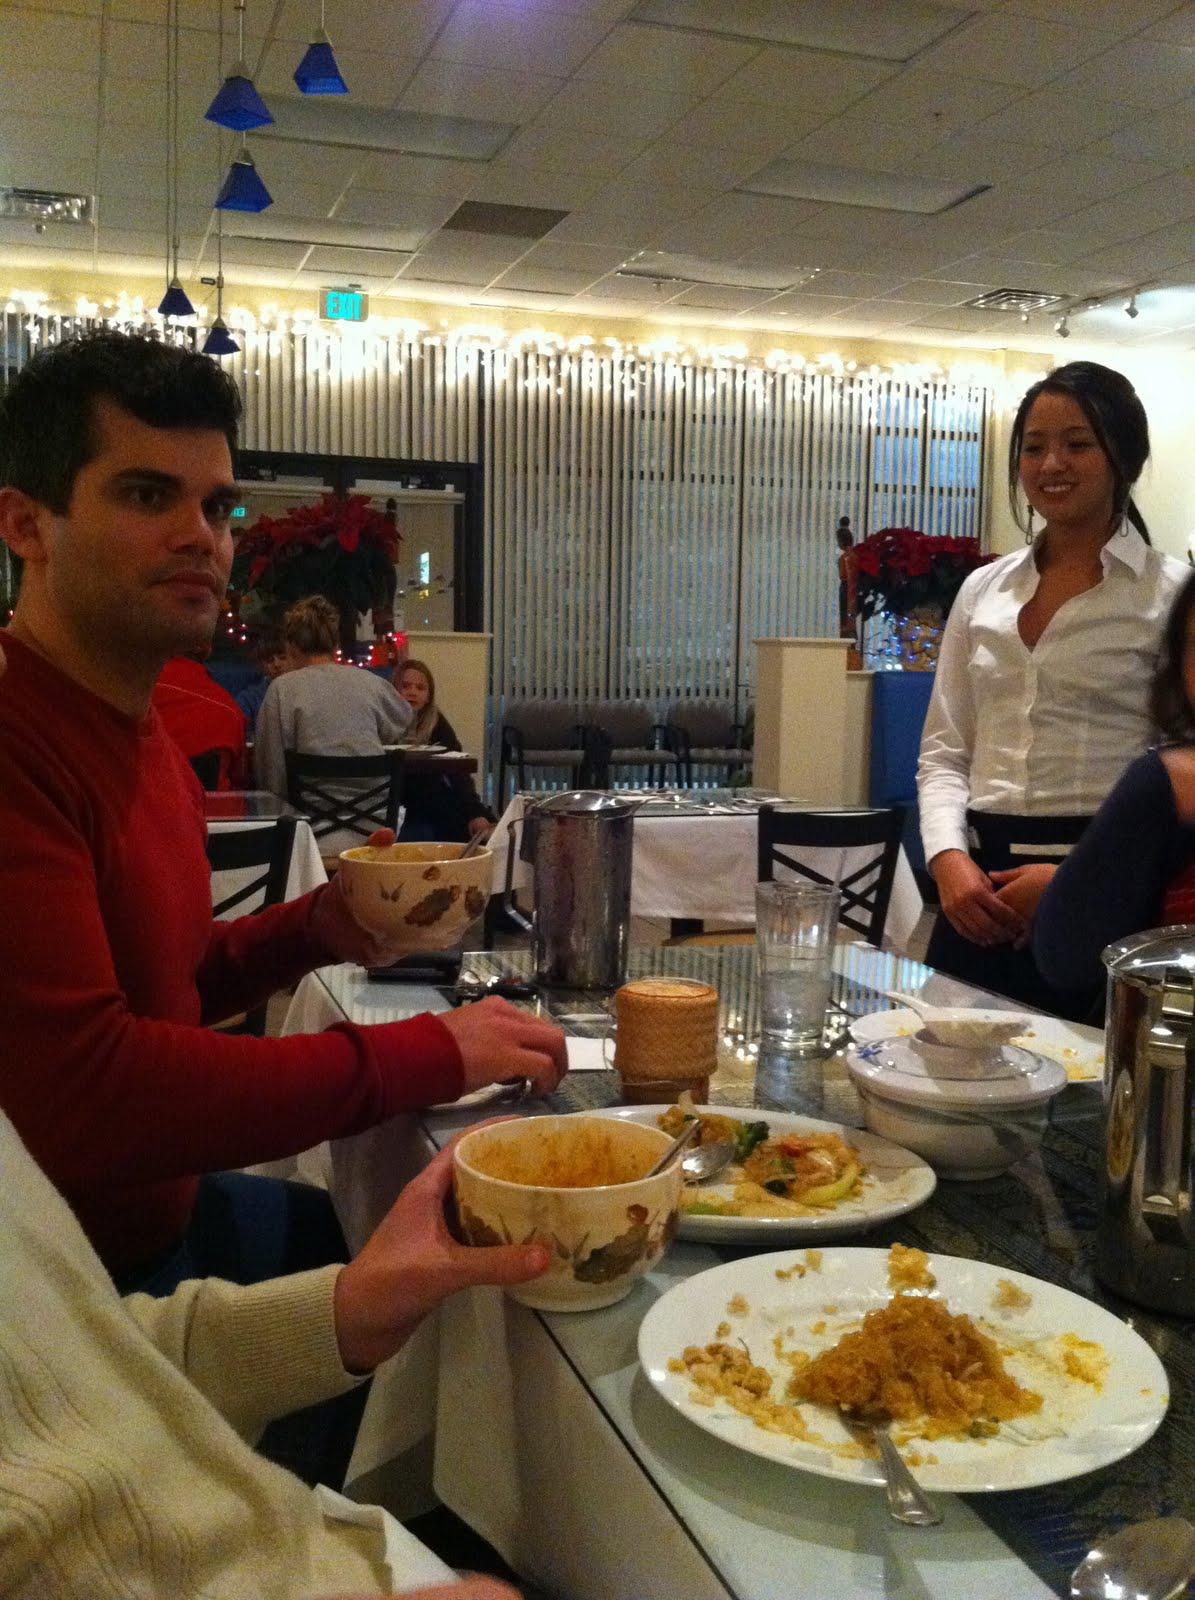 Obscure dinner night jasmine thai lao cuisine for Ano thai lao cuisine